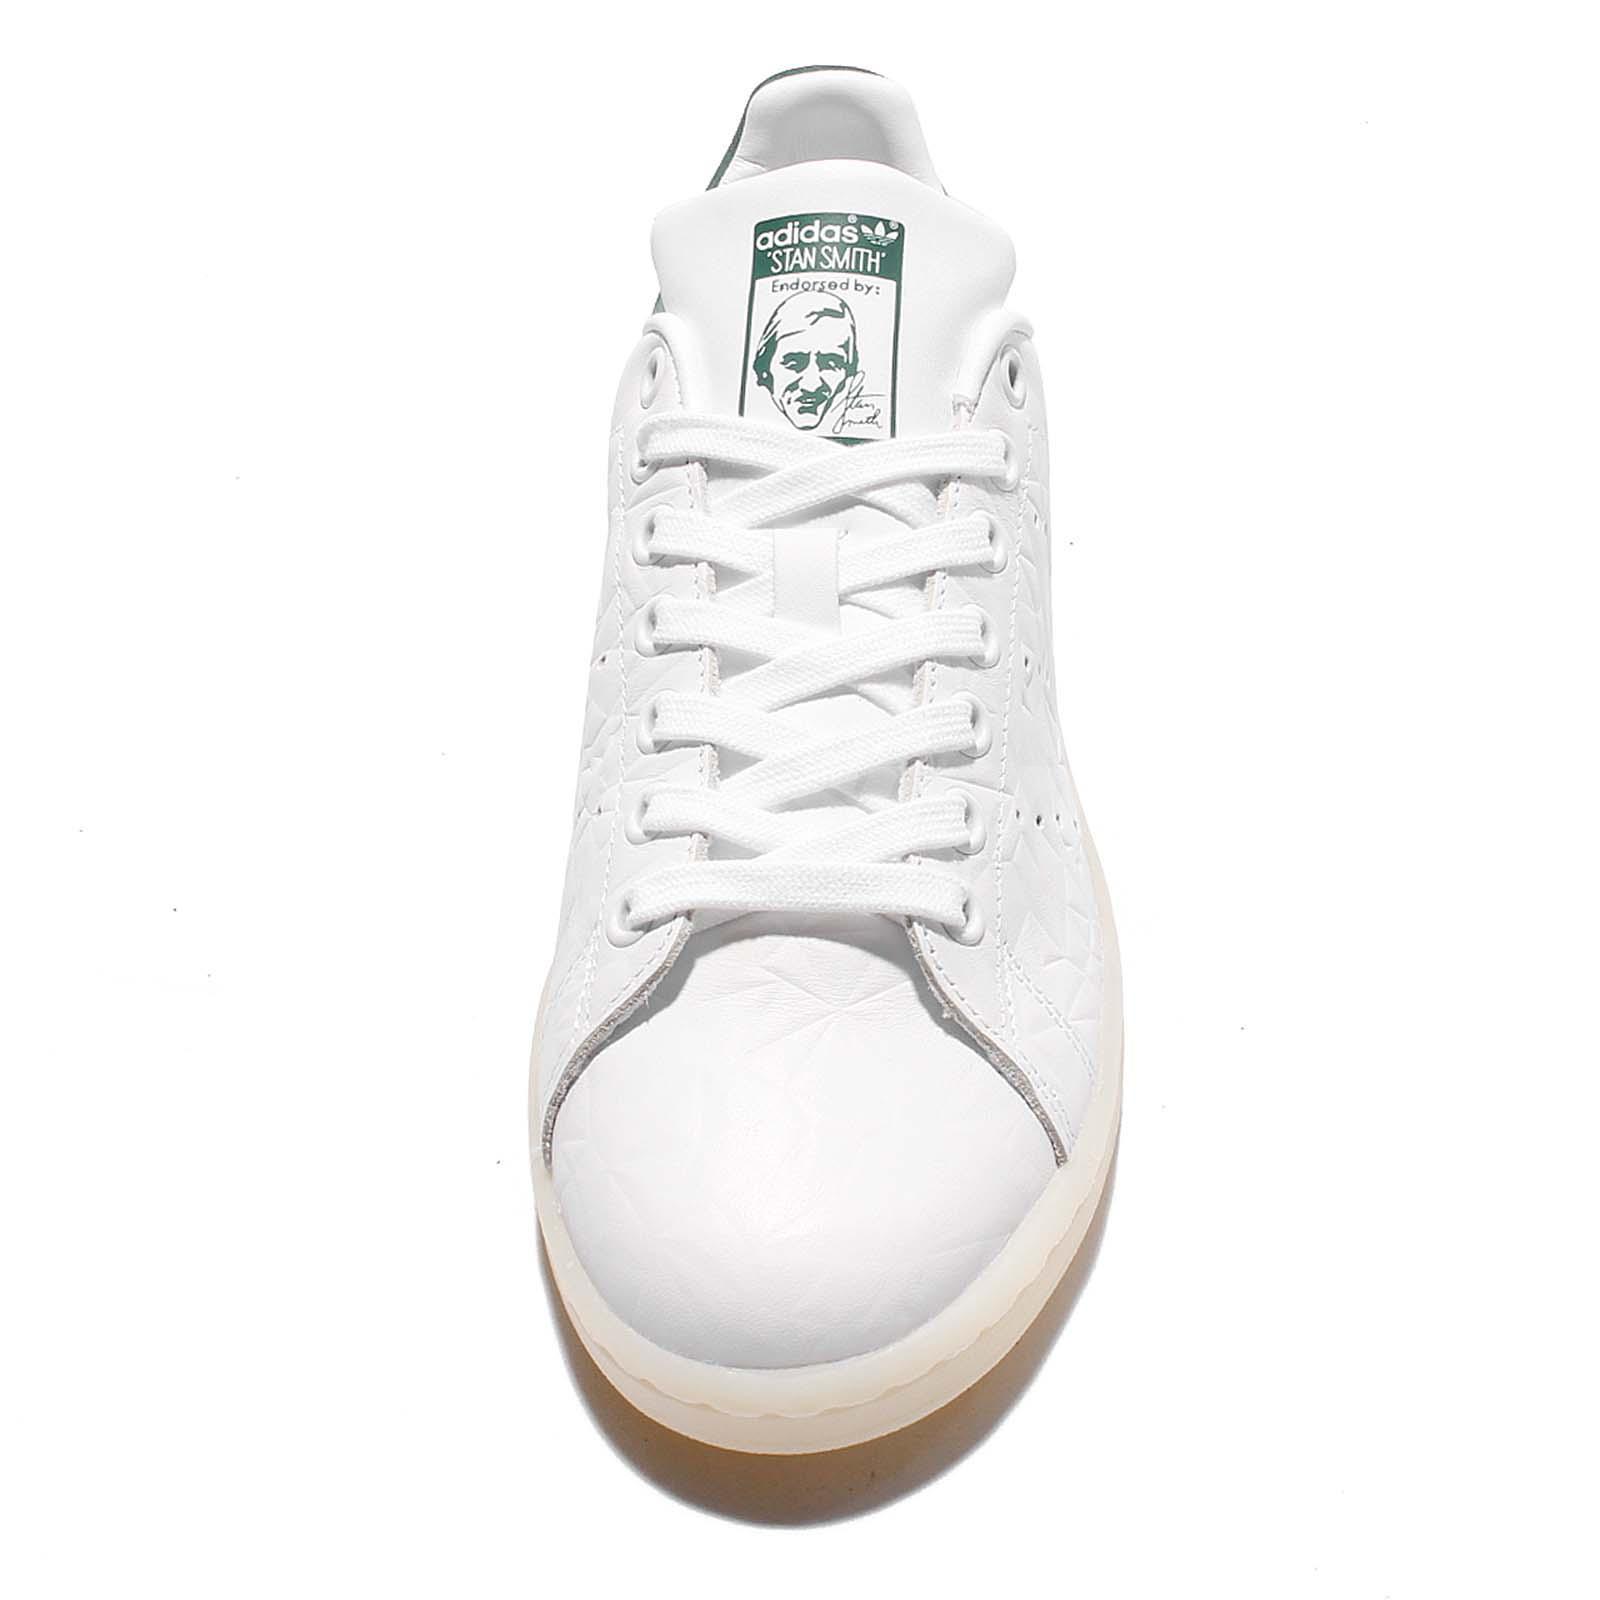 pretty nice b1f91 56c9d best price adidas stan smith sizing guide f4f39 0844e